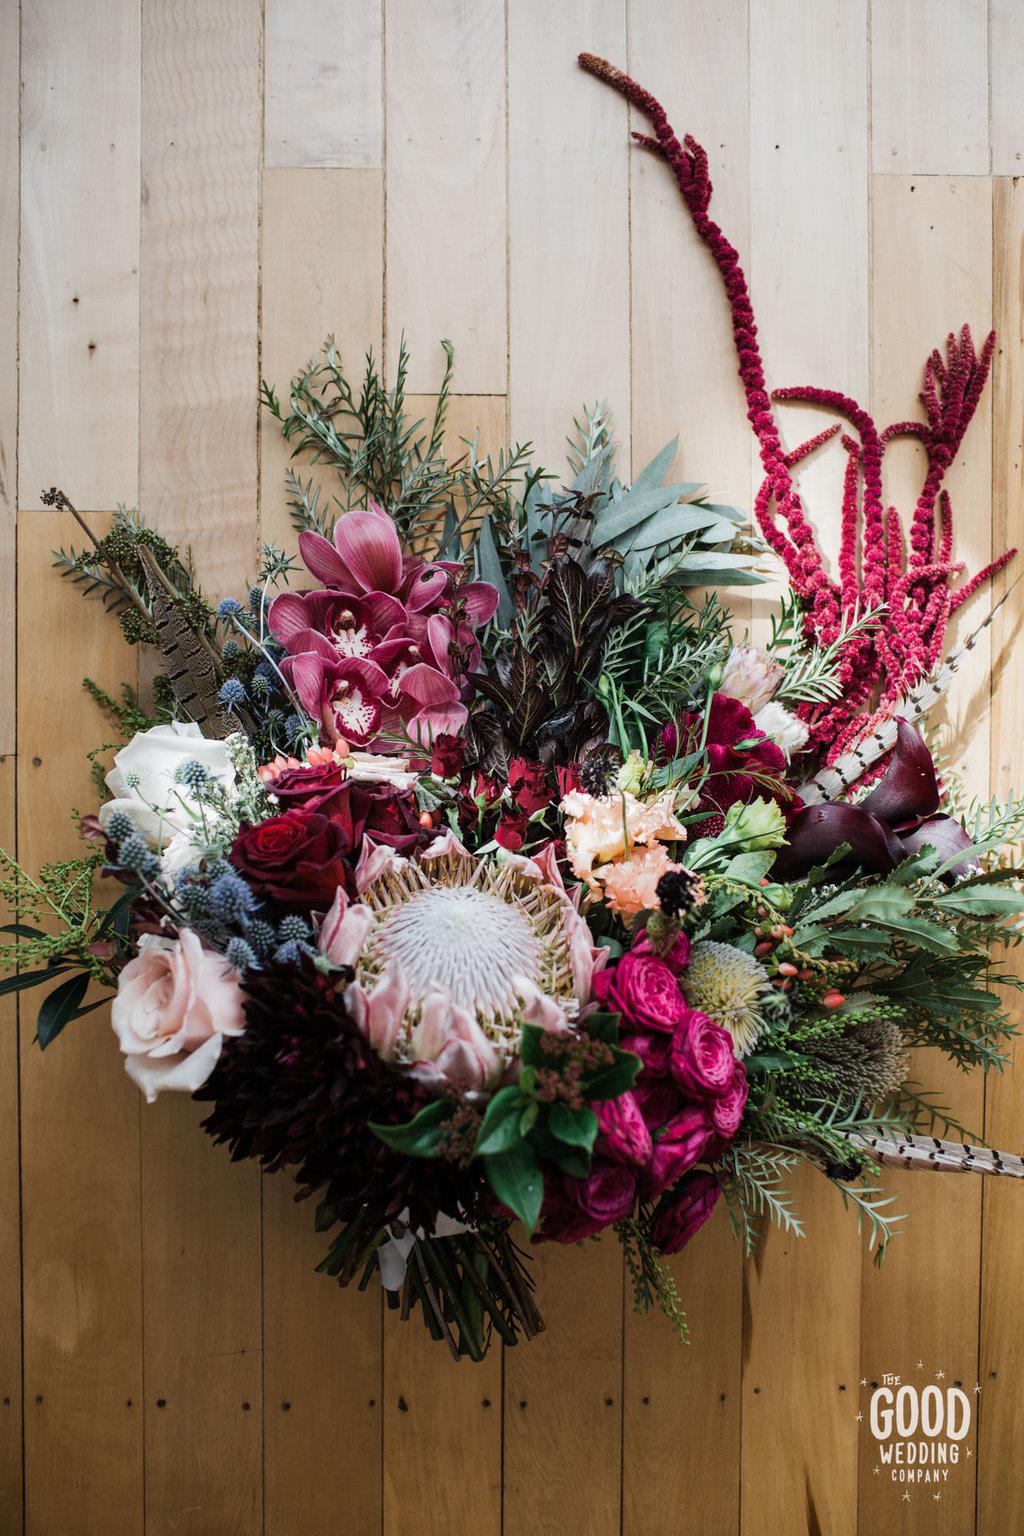 The-Good-Wedding-Company-JessKyle-Queenstown-wedding-photographer-35.jpg